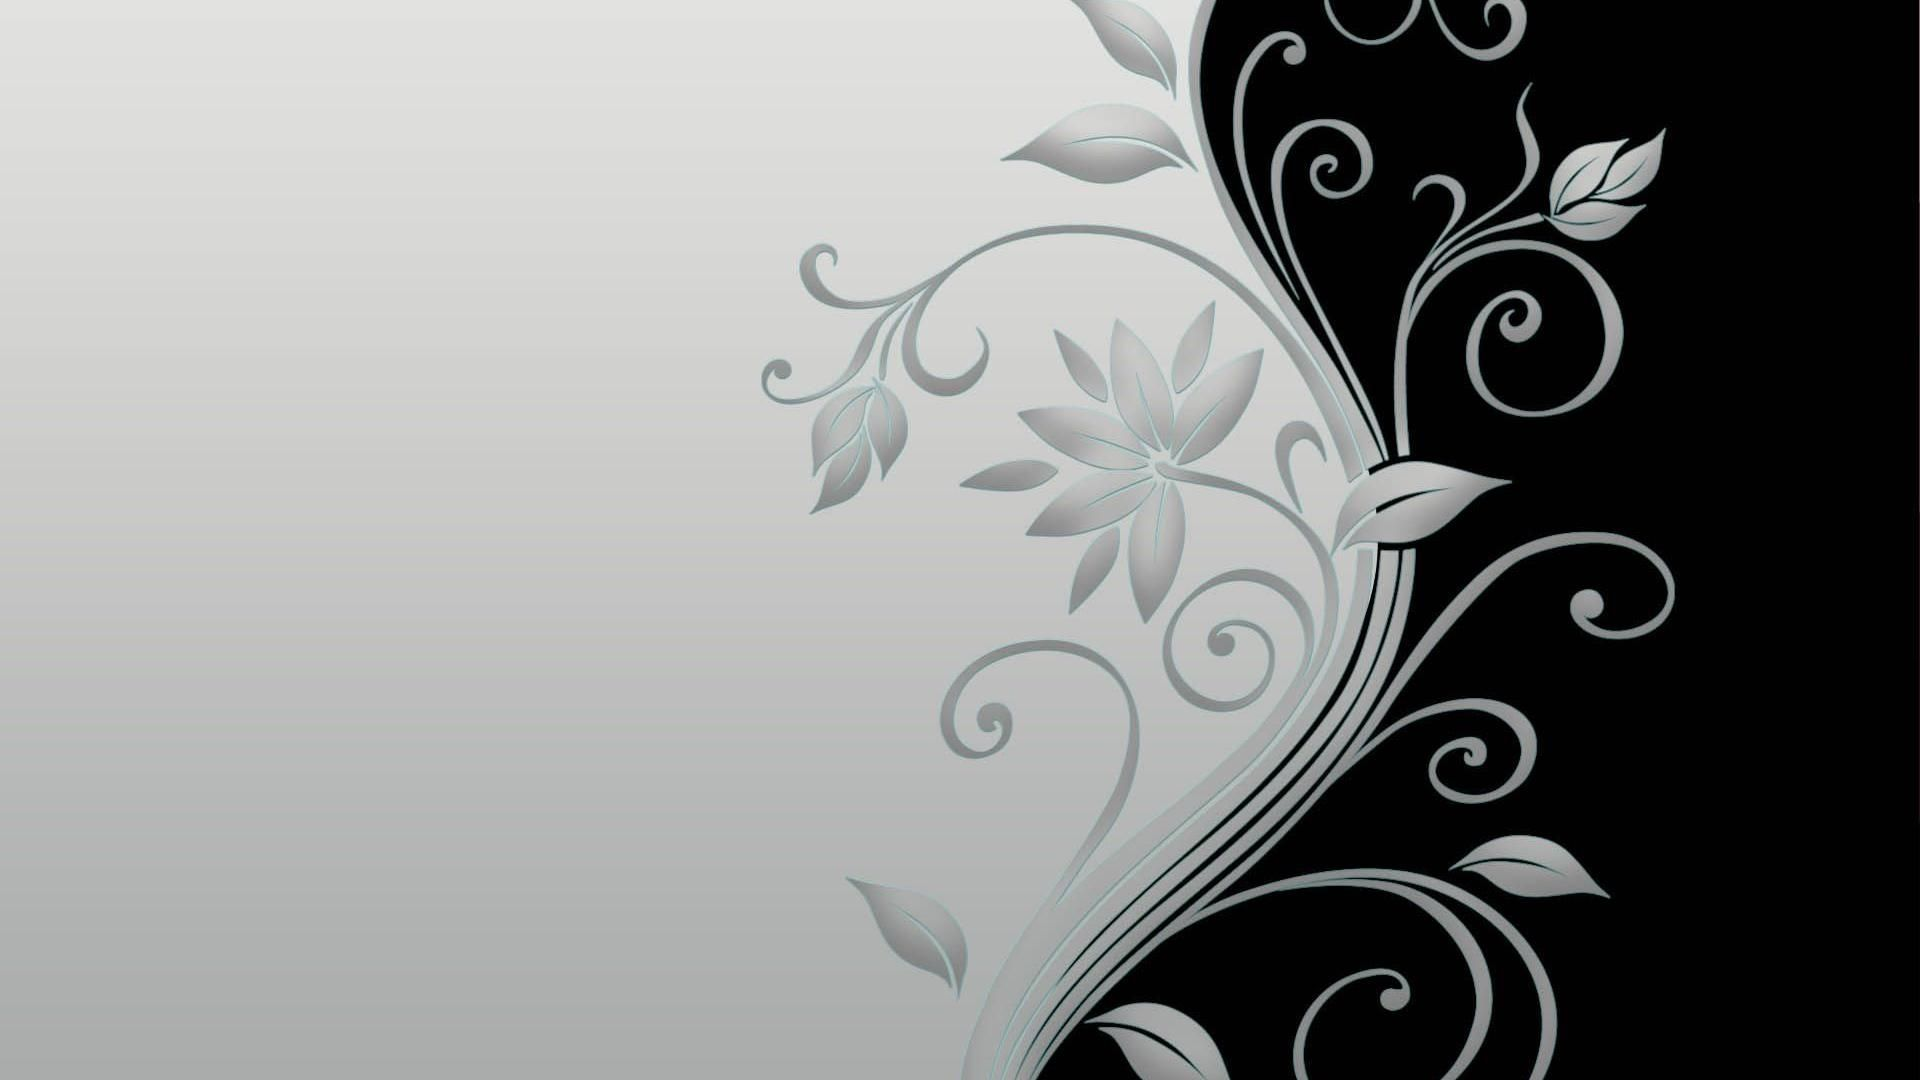 Hd wallpaper vector - Vector Flower Black And White Hd Wallpaper Of Vector 1920x1080px Hd Wallpapers 5885